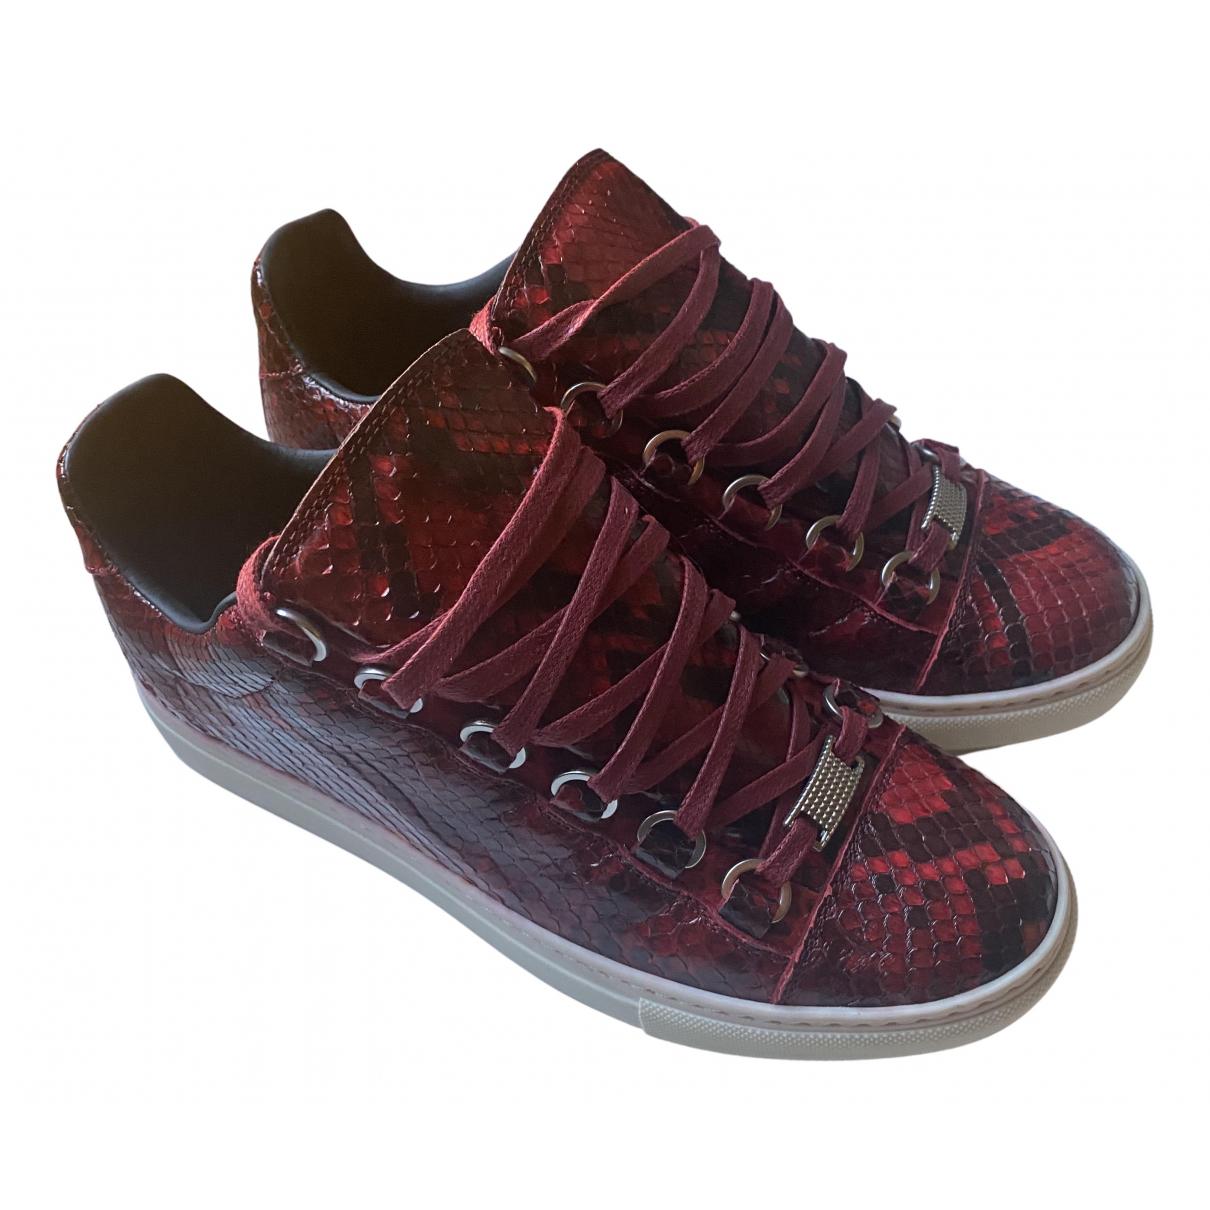 Balenciaga \N Sneakers in  Bordeauxrot Wasserschlangen